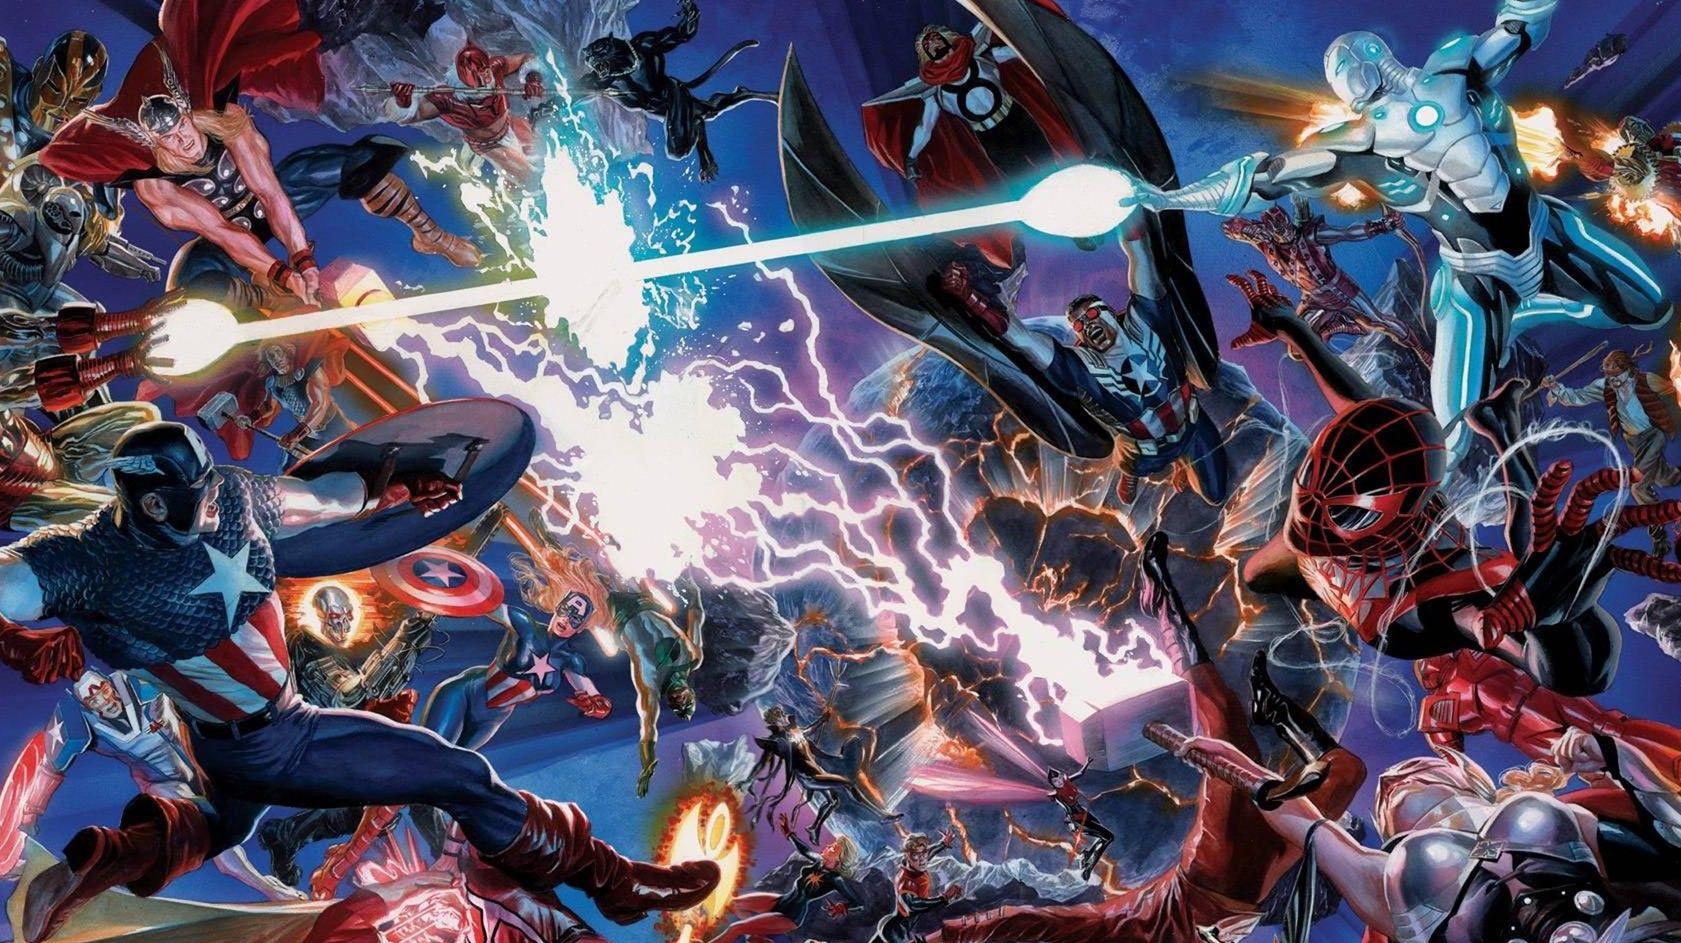 Download Wallpaper Marvel Secret Wars - b0b9e8a5c22ed26bd84e0ba45dfcf823  Pictures_274156.jpg